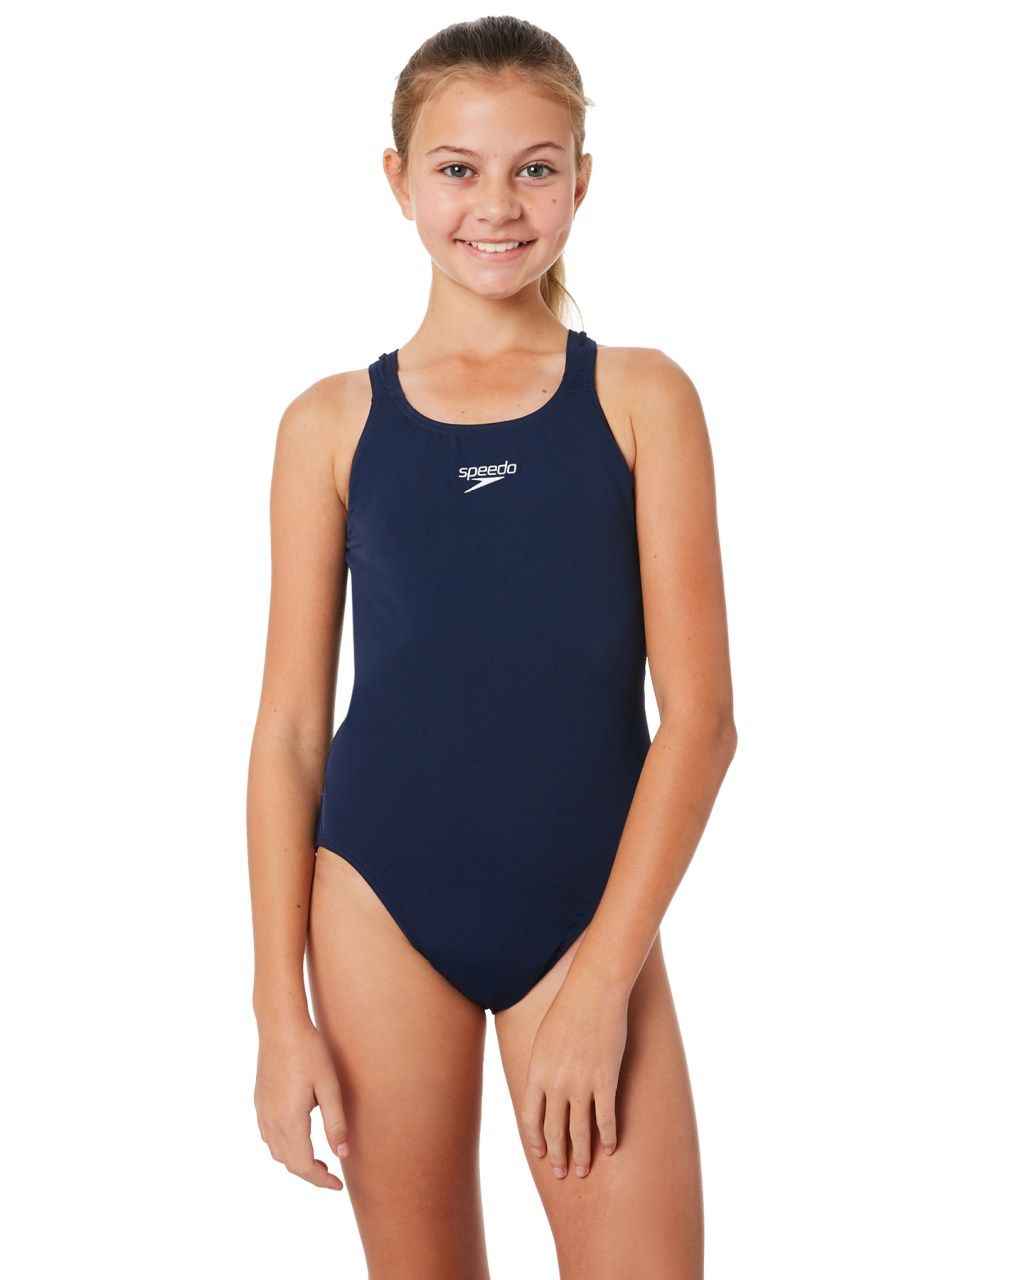 4ab1ab091ca95 Speedo Kids Girls Endurance Medalist One Piece Navy Navy Girls swimsuits  Size 8